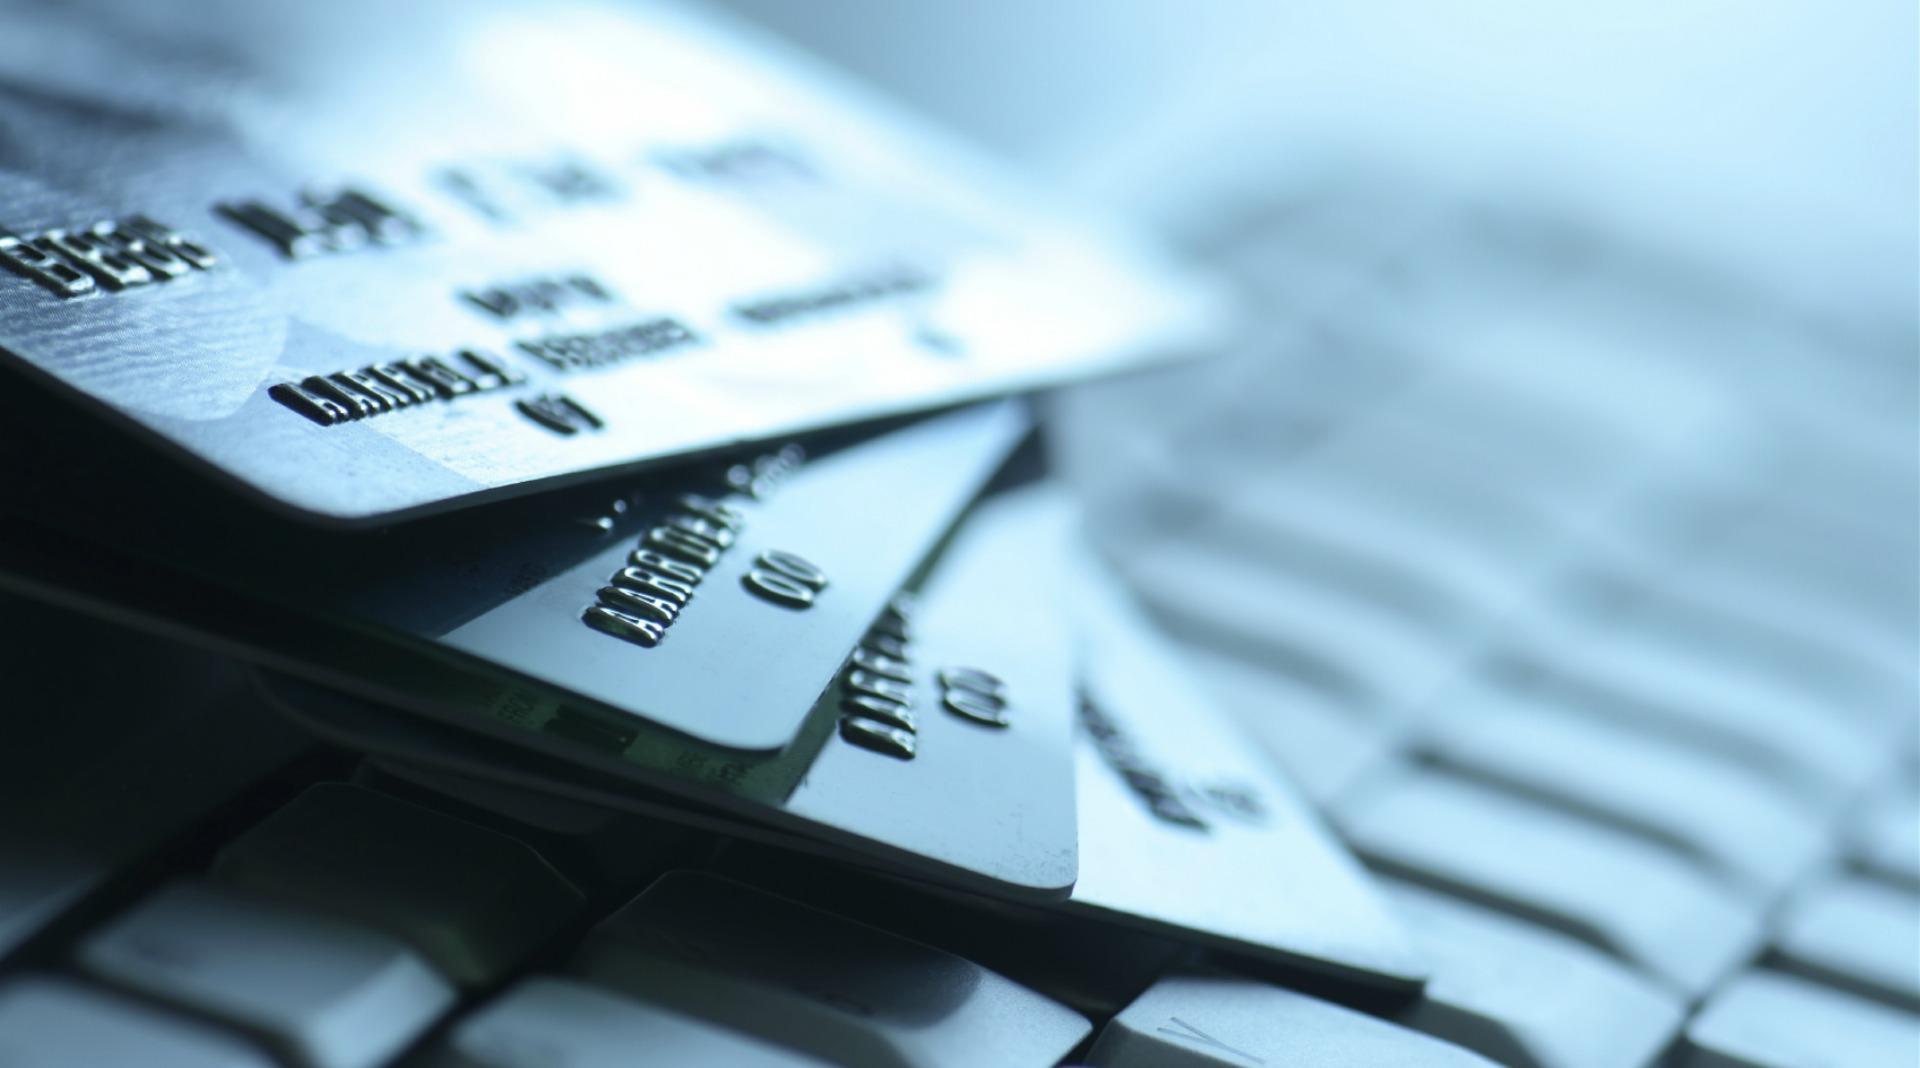 Онлайн кредитование для вас